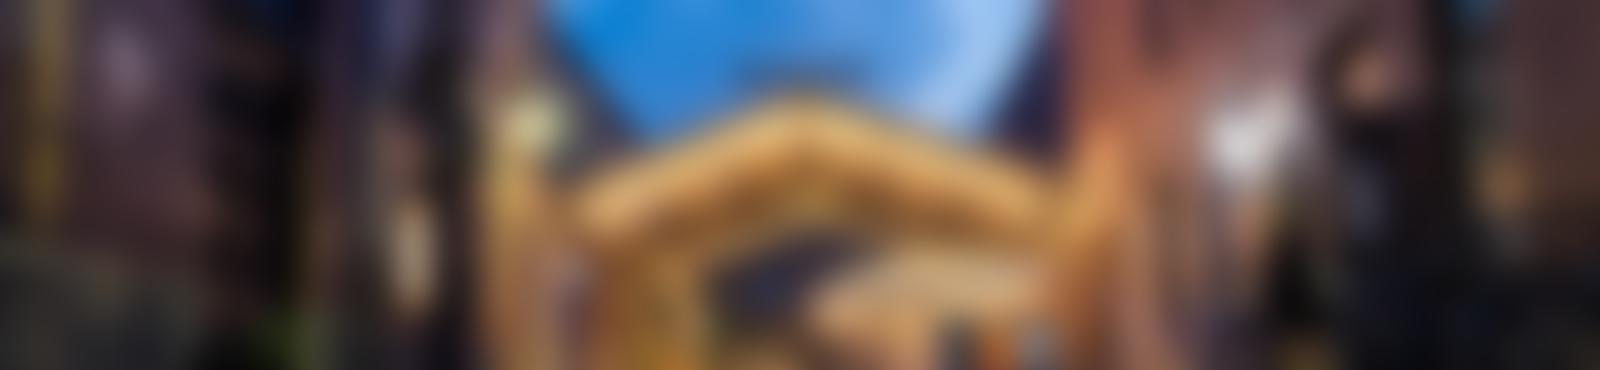 Blurred 992b57cd 5314 49d1 8563 fdf0a8091335